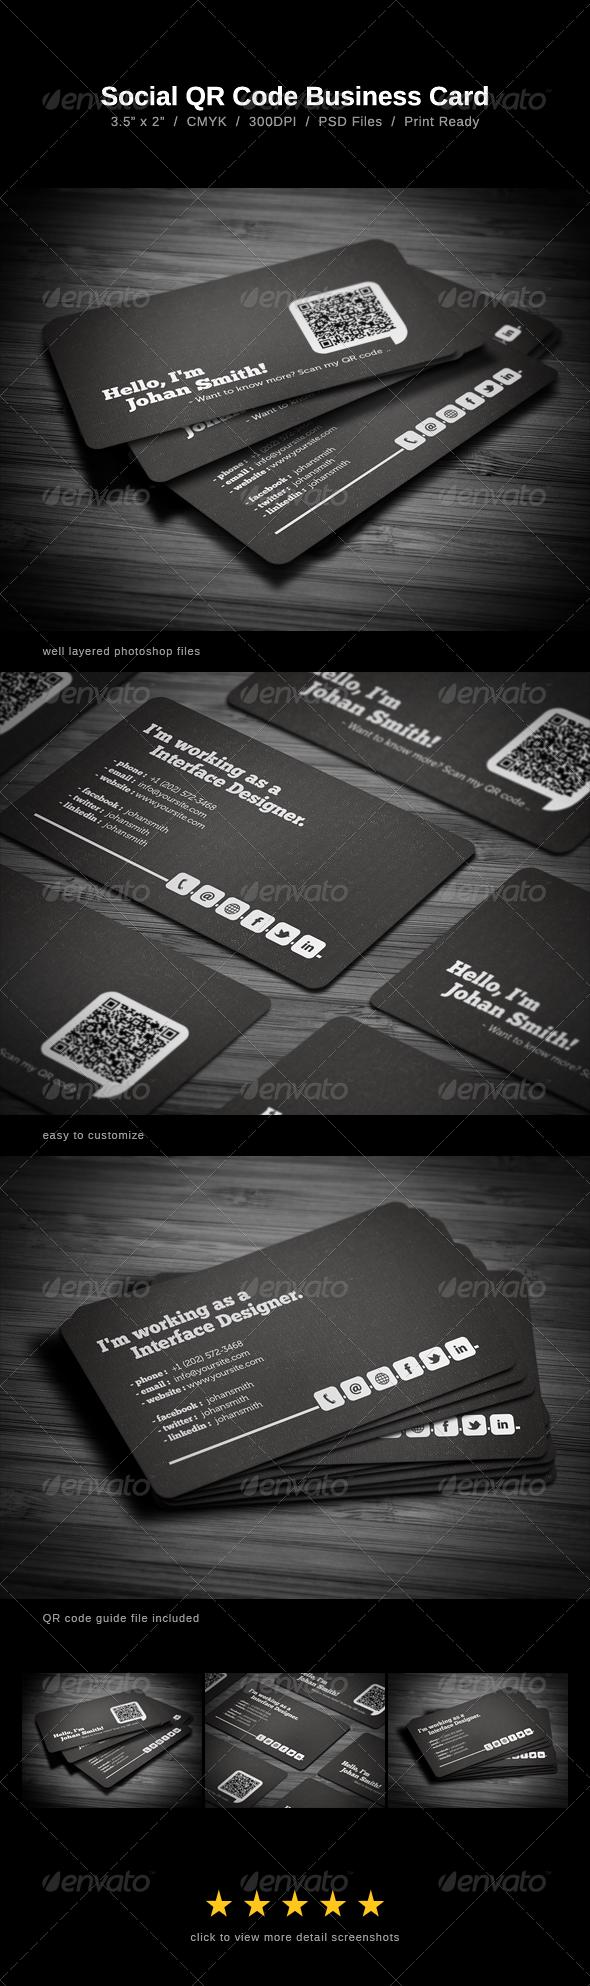 Social qr code business card creative business card template psd social qr code business card creative business card template psd reheart Gallery